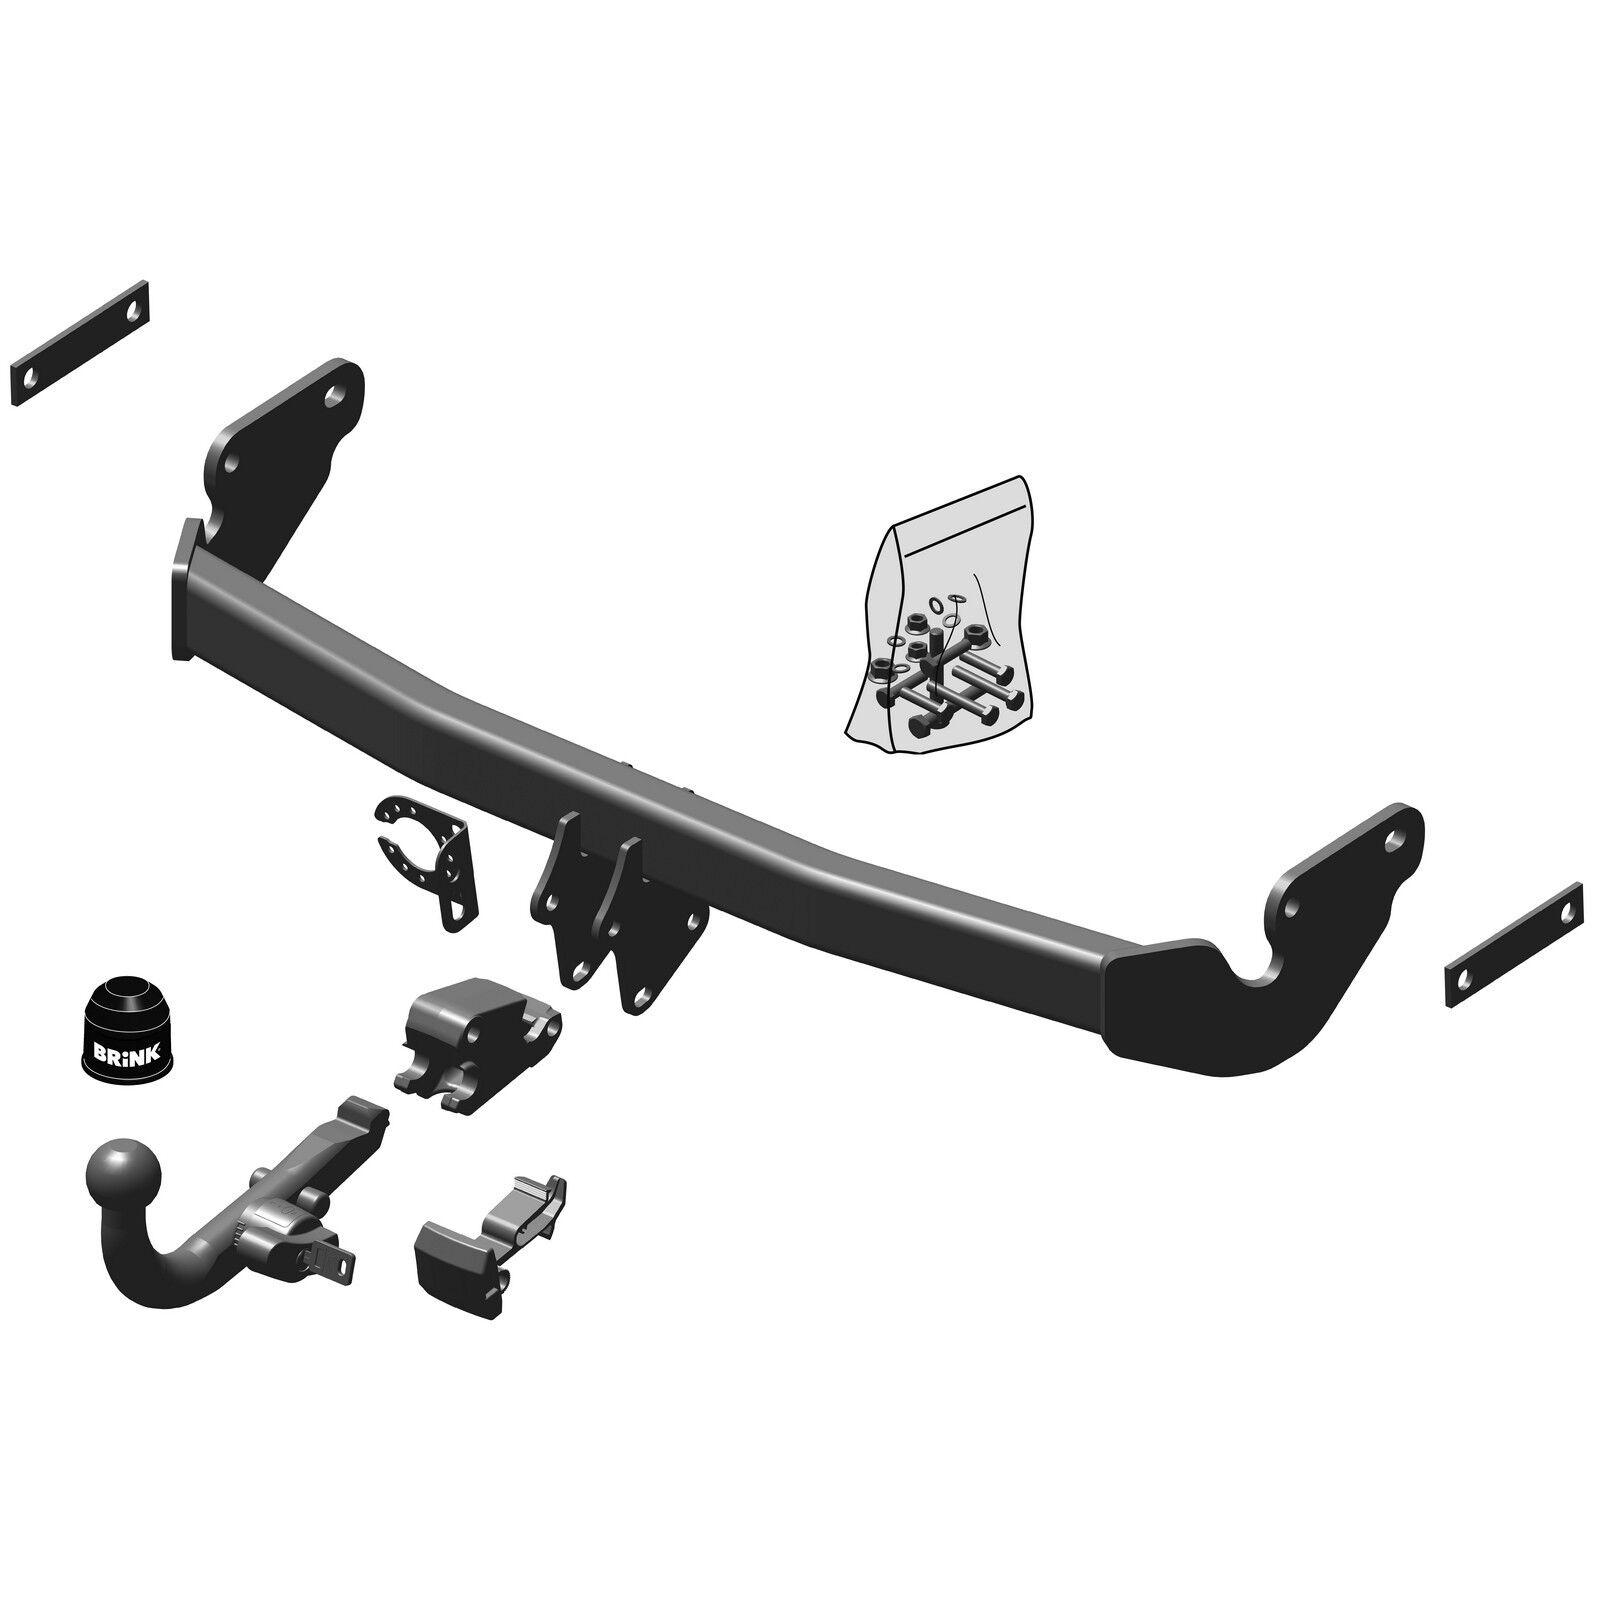 Brink Towbar For Jeep Compass 2011 2017 Detachable Tow Bar Ebay